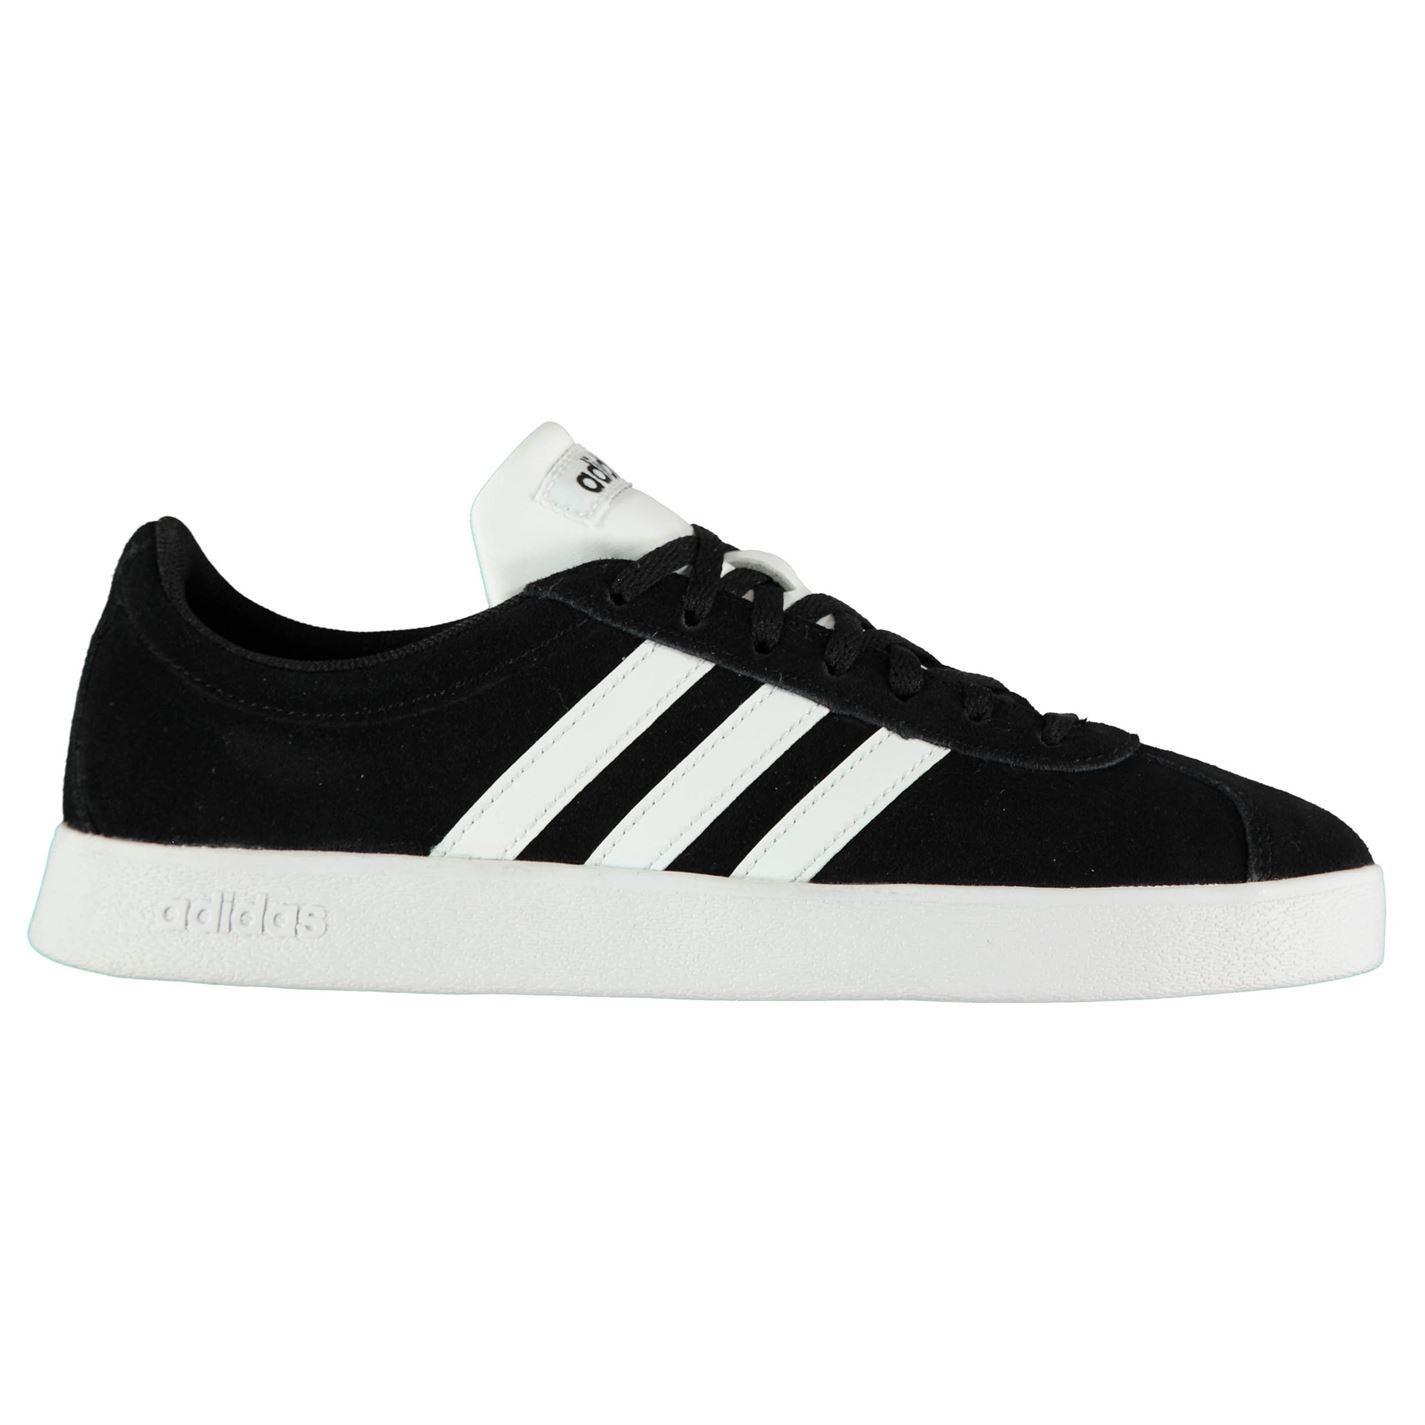 scarpe da uomo scarpe adidas vl corte da9853 uk 9 ebay